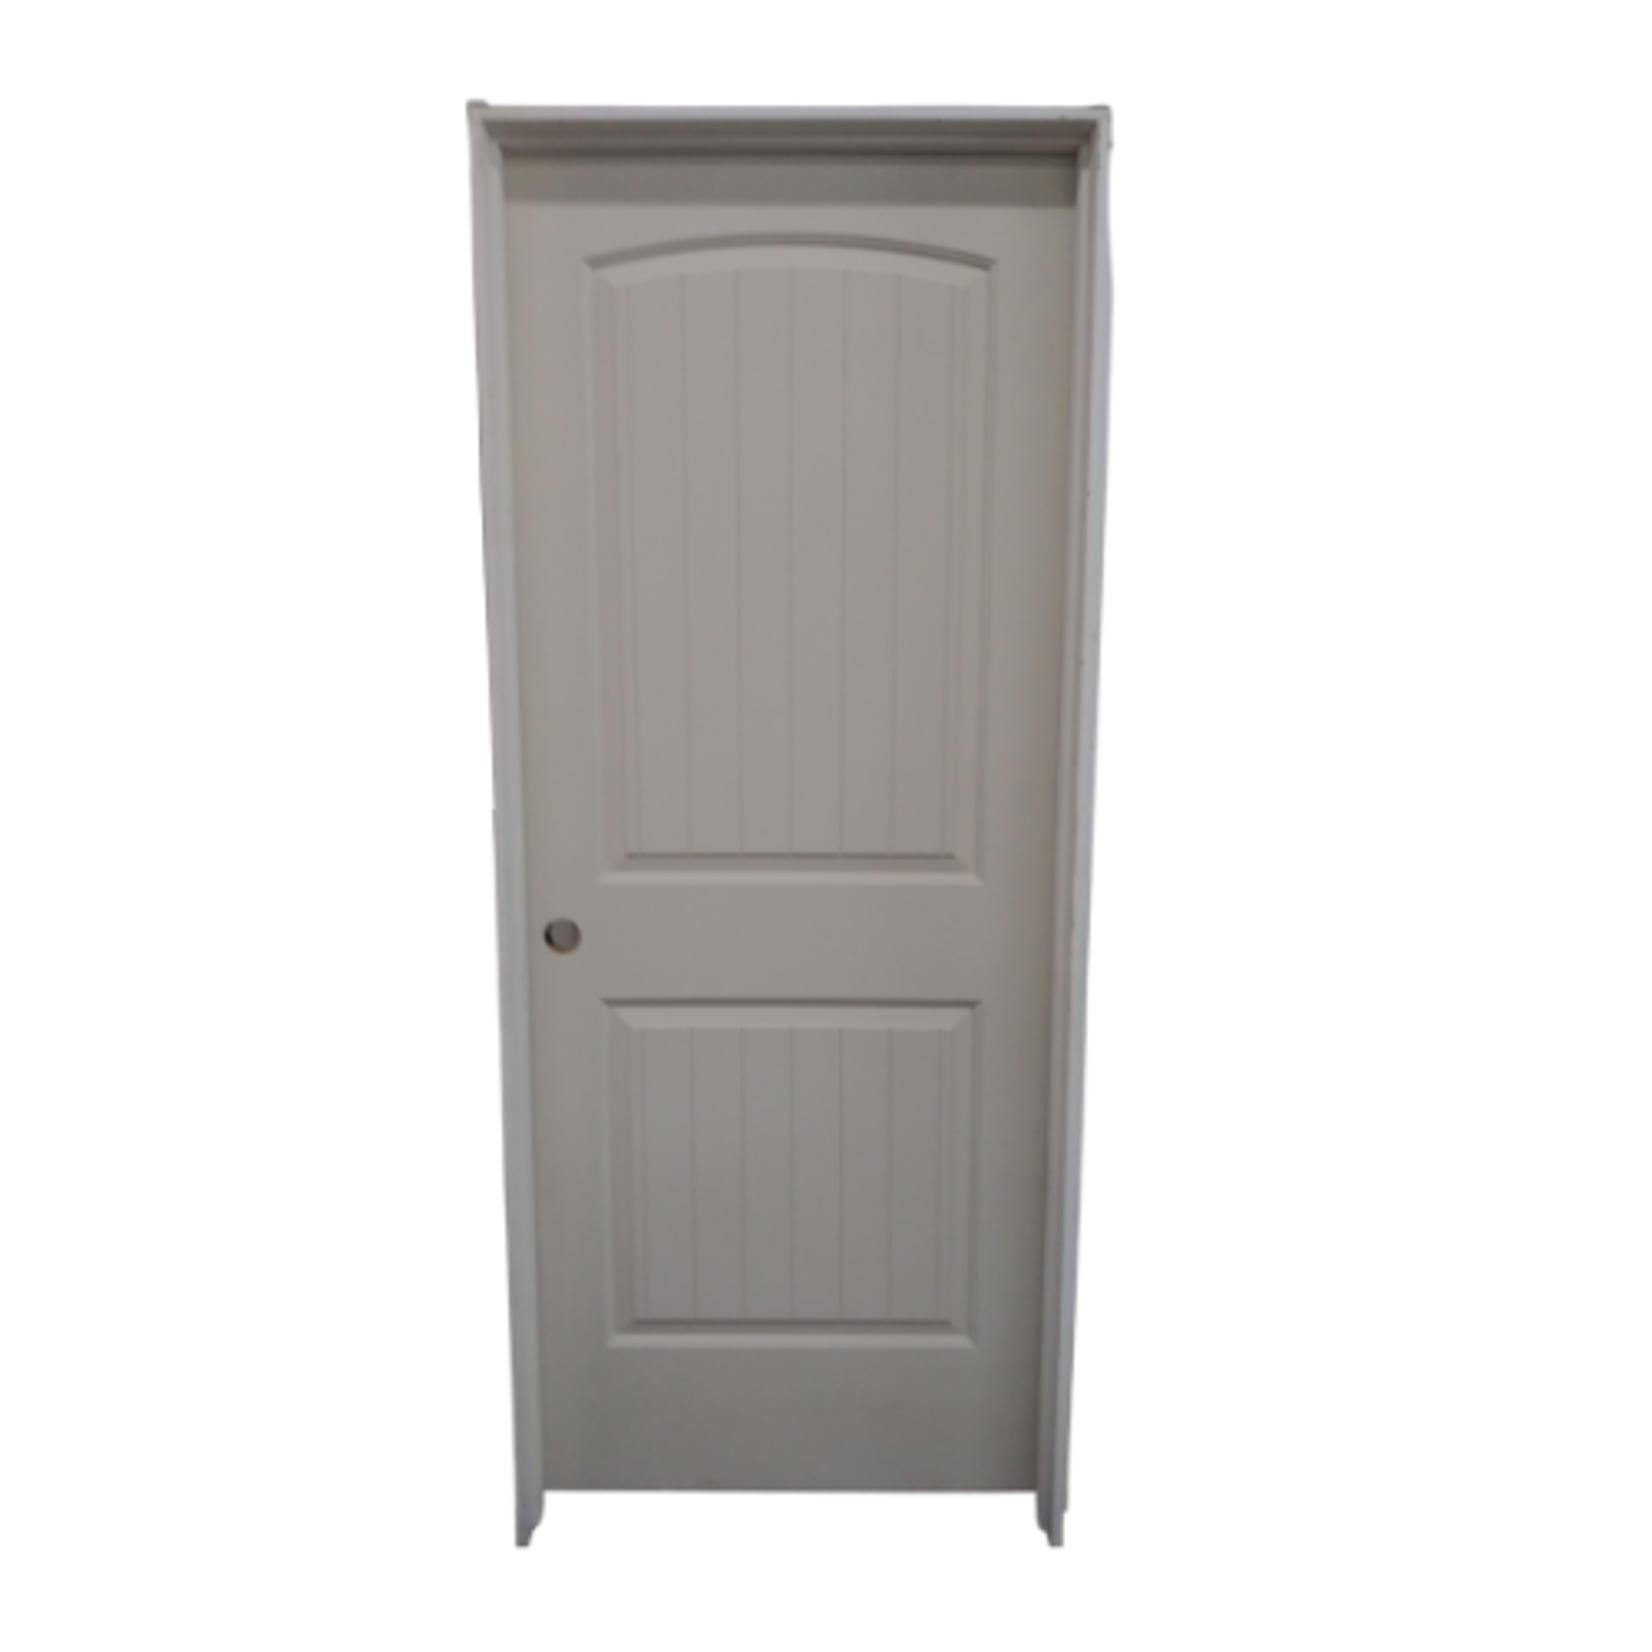 10434 White Primed Pre-Hung 2-Panel Interior Door